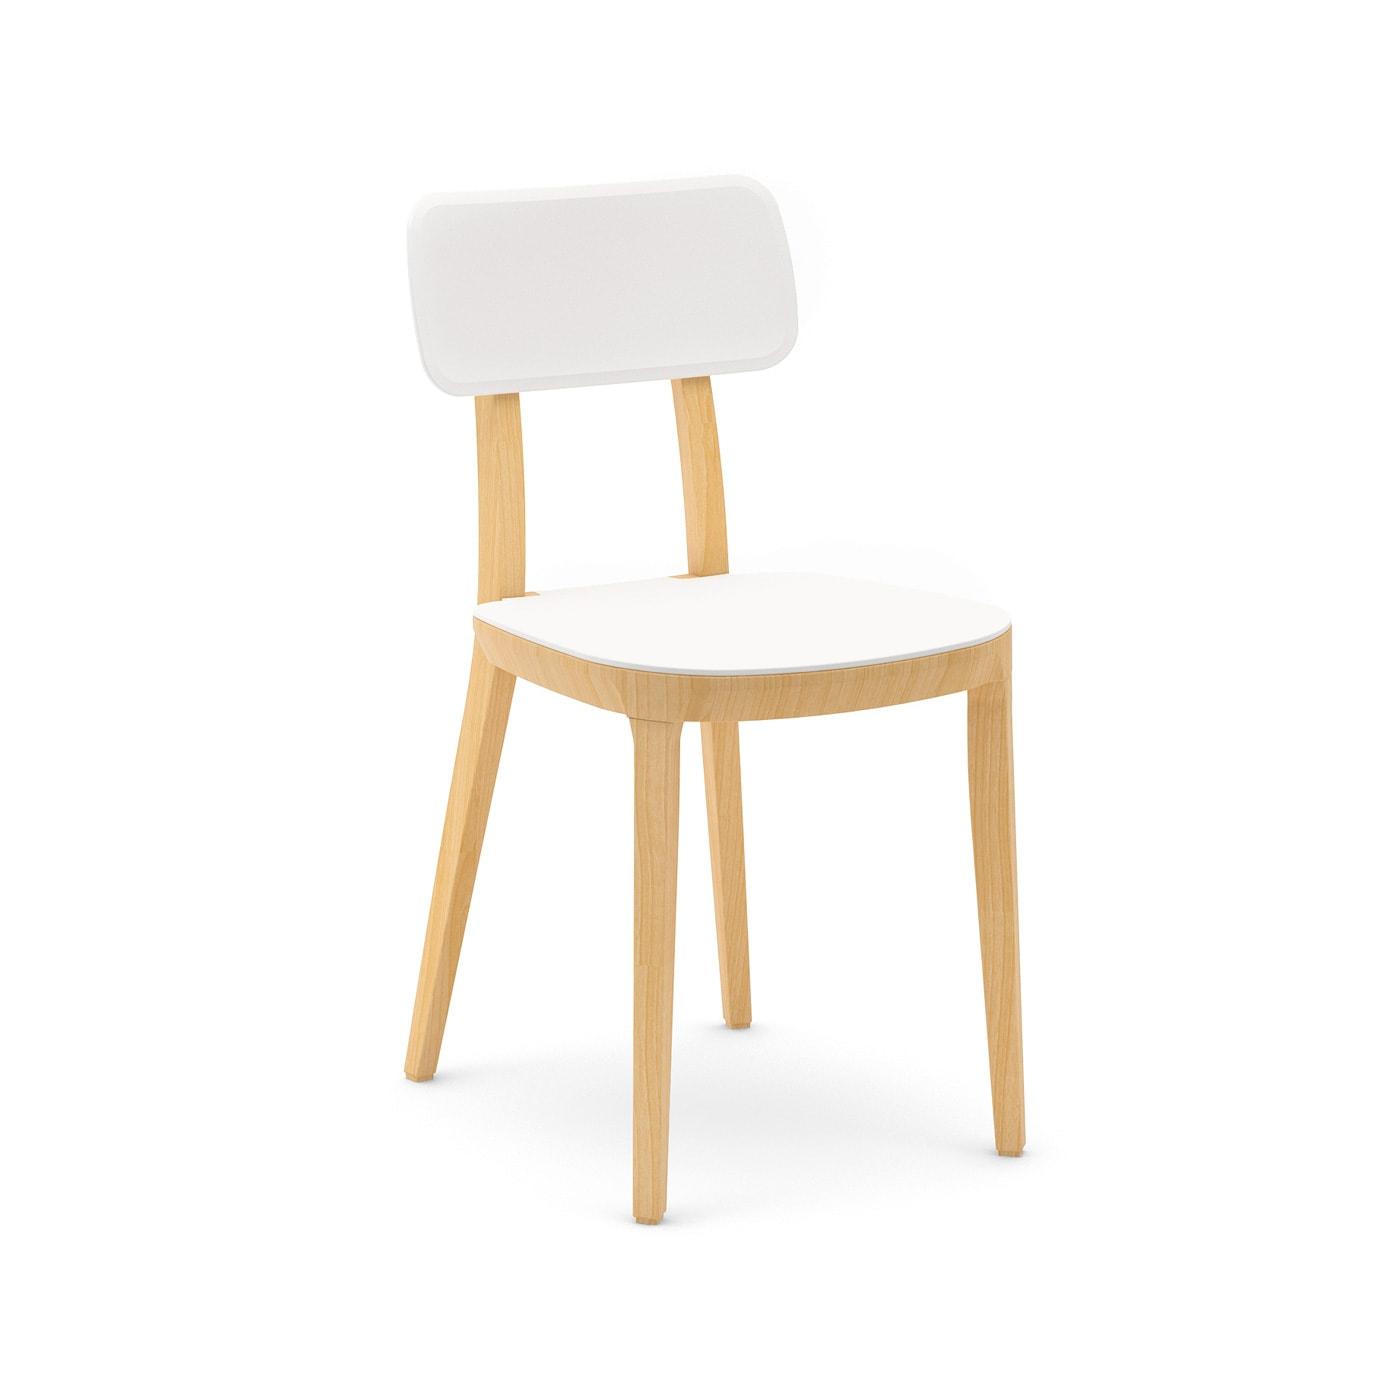 INFINITI Porta Venezia sedia gambe legno